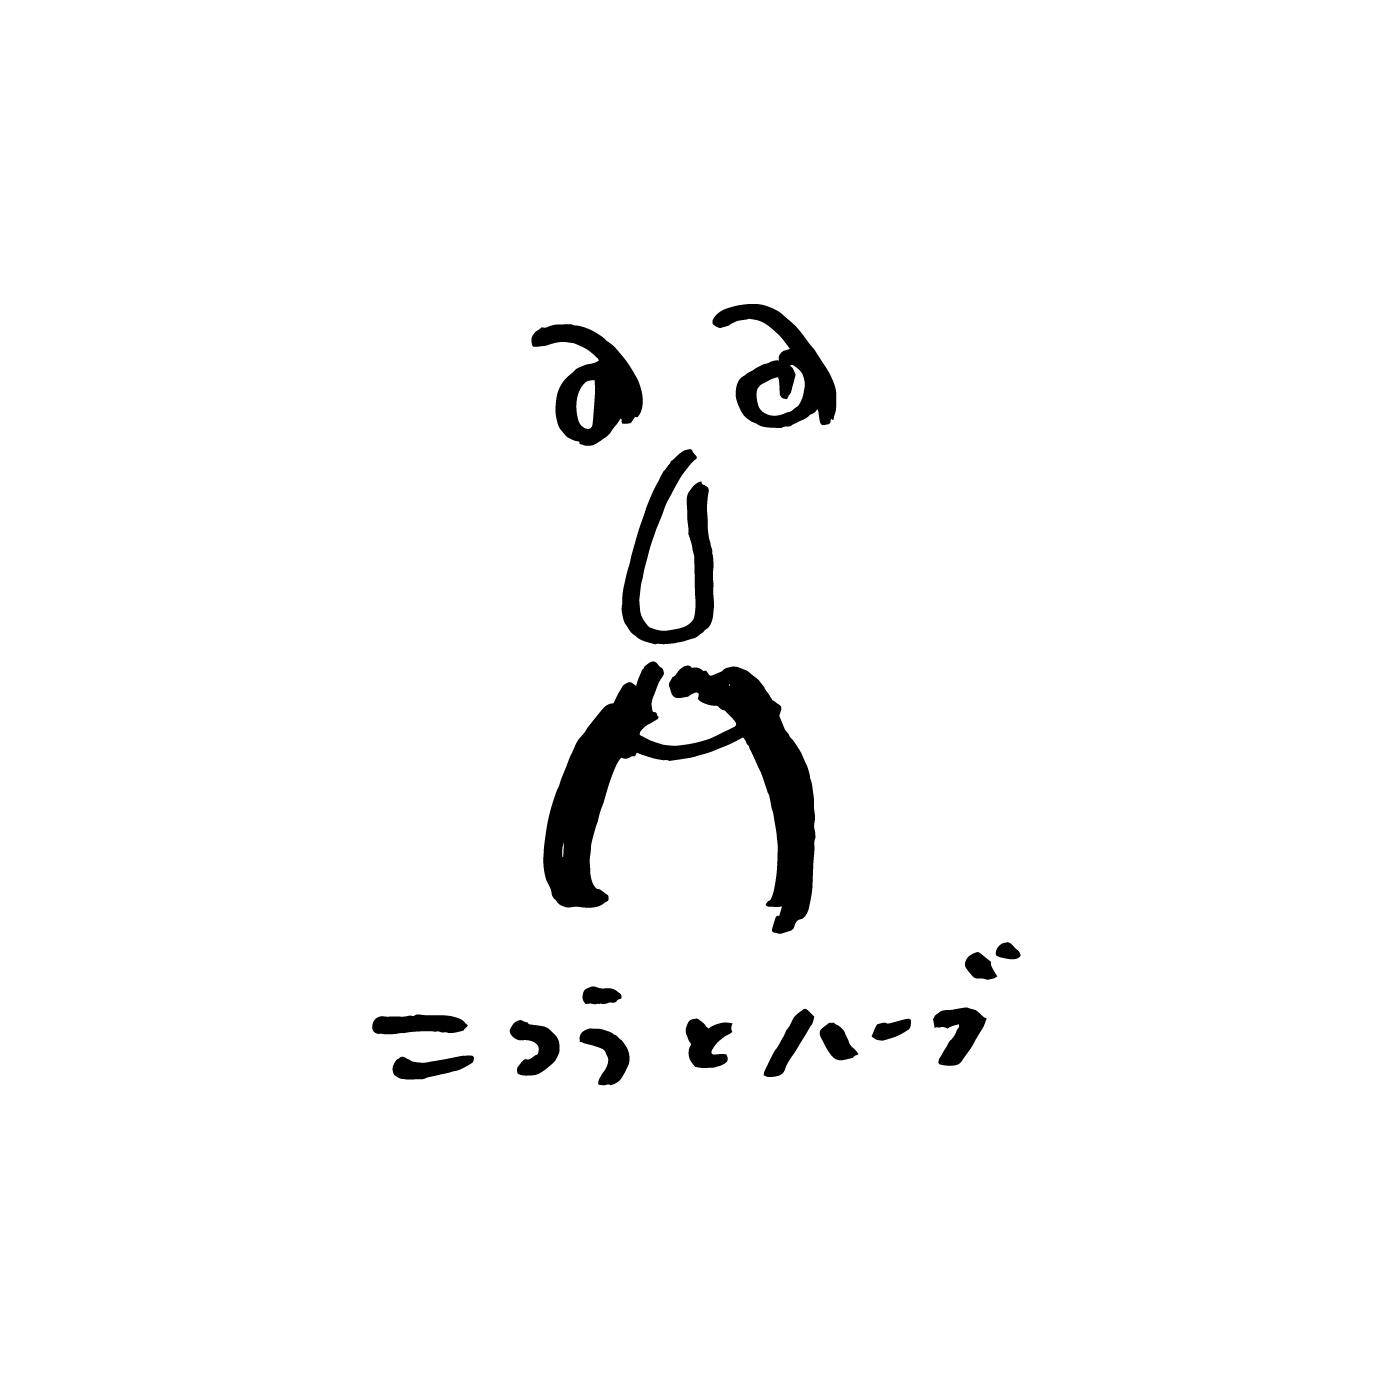 Nicolas & Herbs|Identity VI, Graphics, ロゴ|グラフィックデザイン|神奈川 葉山町